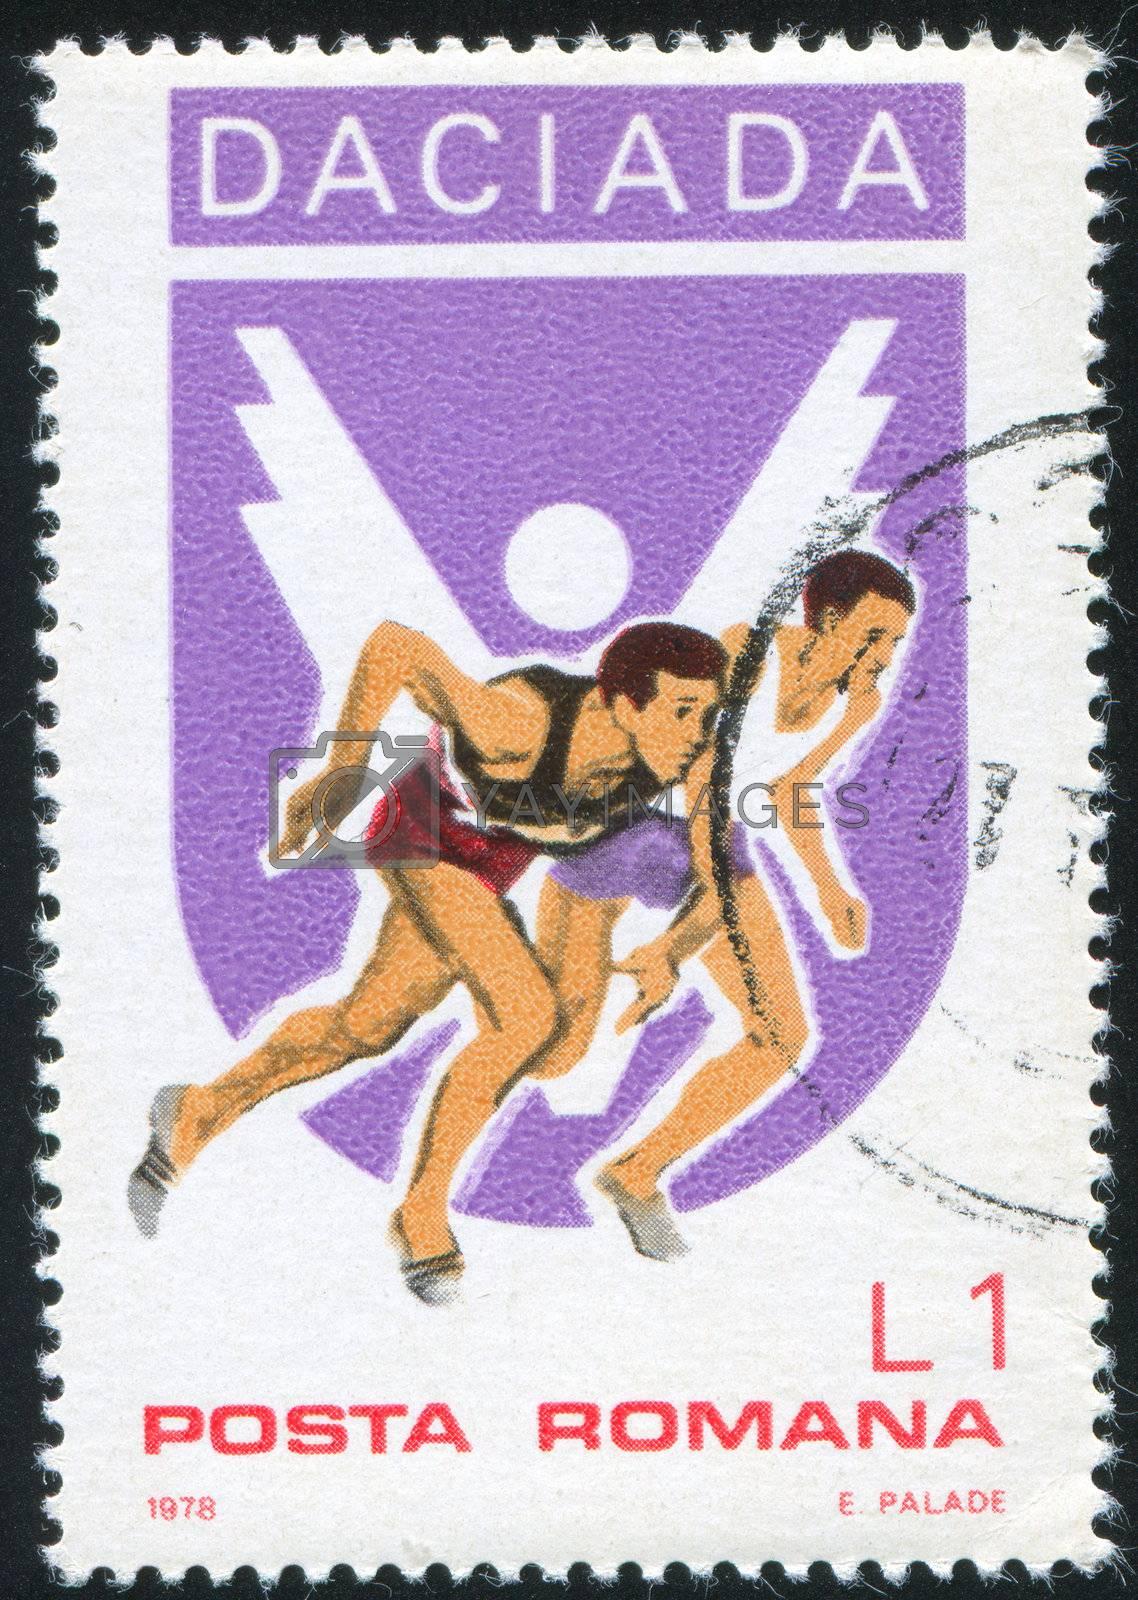 ROMANIA - CIRCA 1978: stamp printed by Romania, show Running, circa 1978.